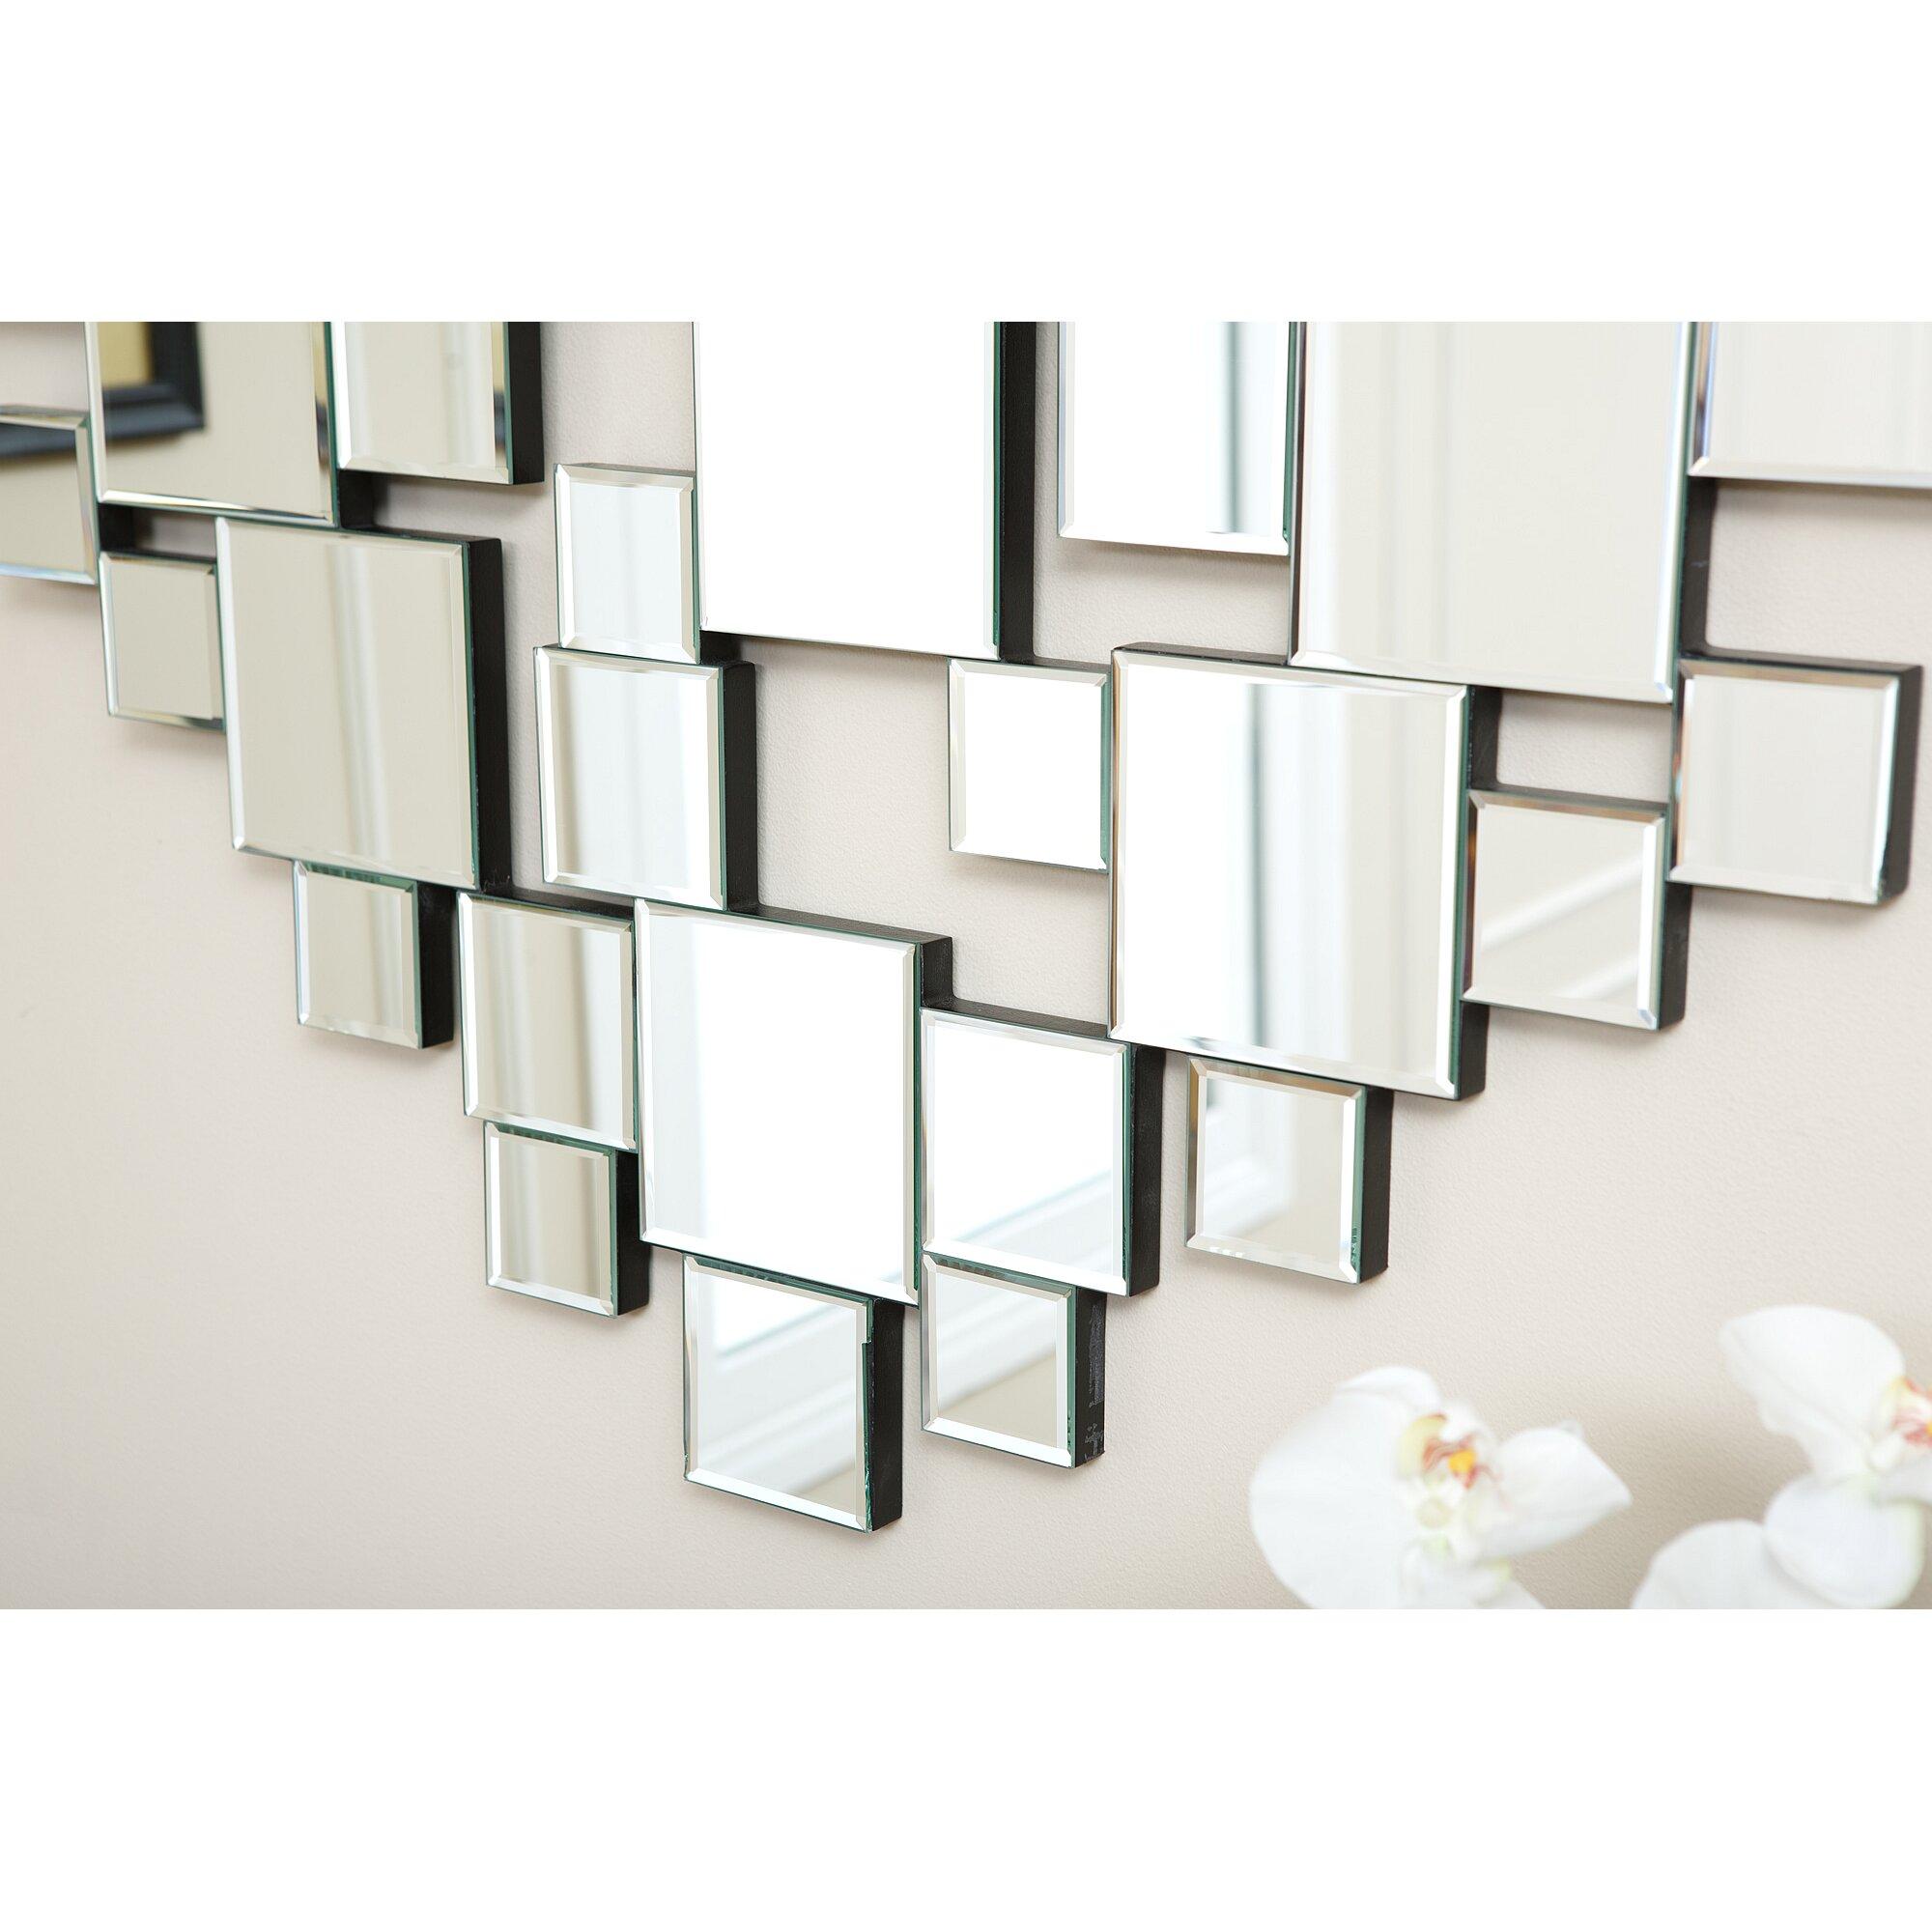 Latitude Run Cooper Oversized Mirrored Wall Decor